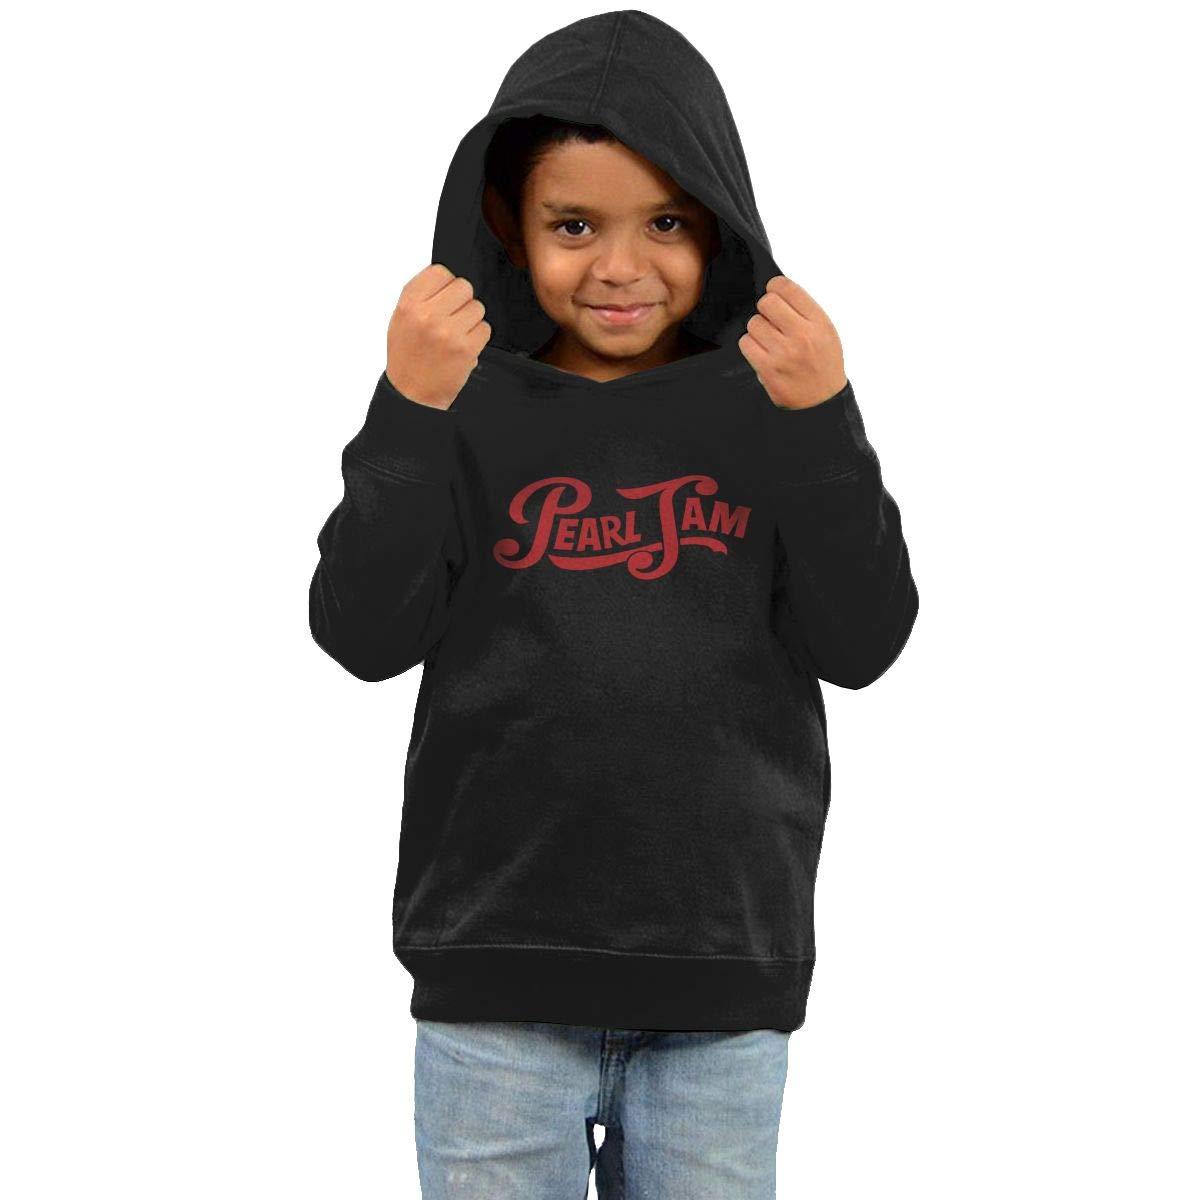 Stacy J. Payne Kids Pearl Jam Cool 40 Black